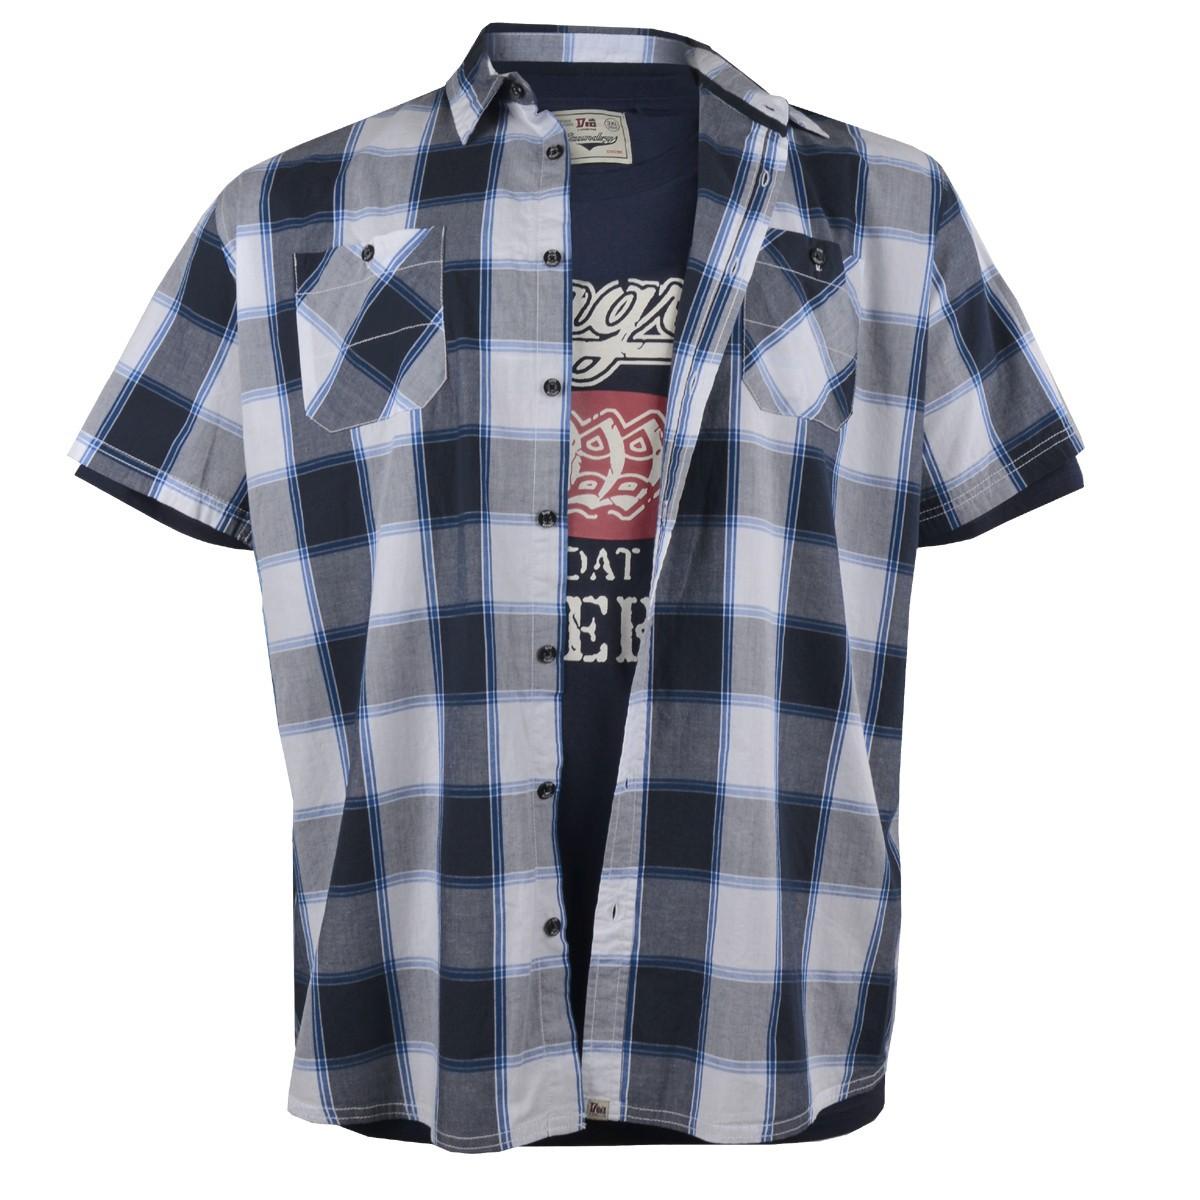 new product 9ca4a f2000 Duke kurzarm Hemd und T-Shirt Set blau weiß kariert - extra Länge